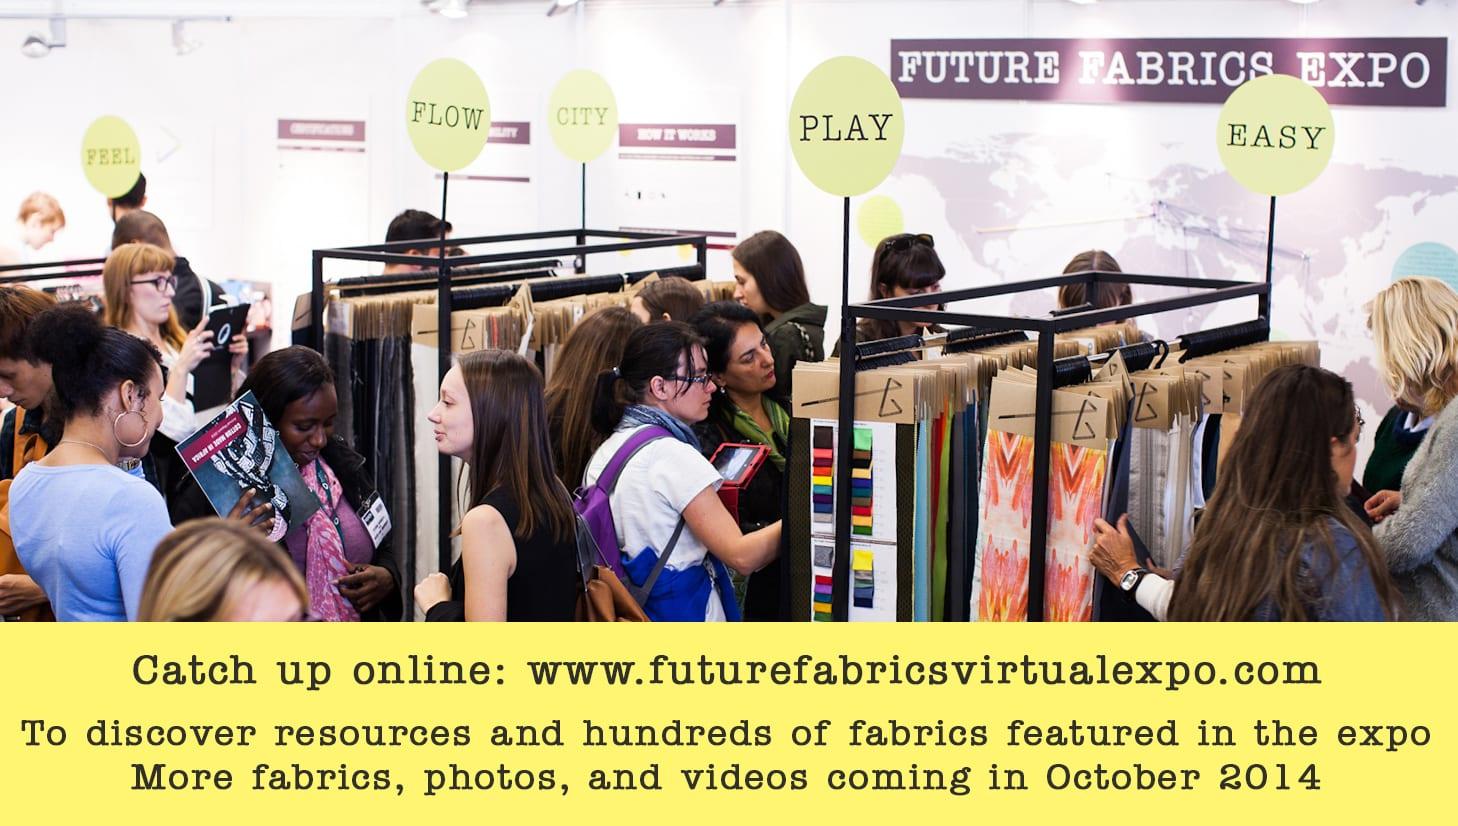 Future-Fabrics-Expo-2014_banner